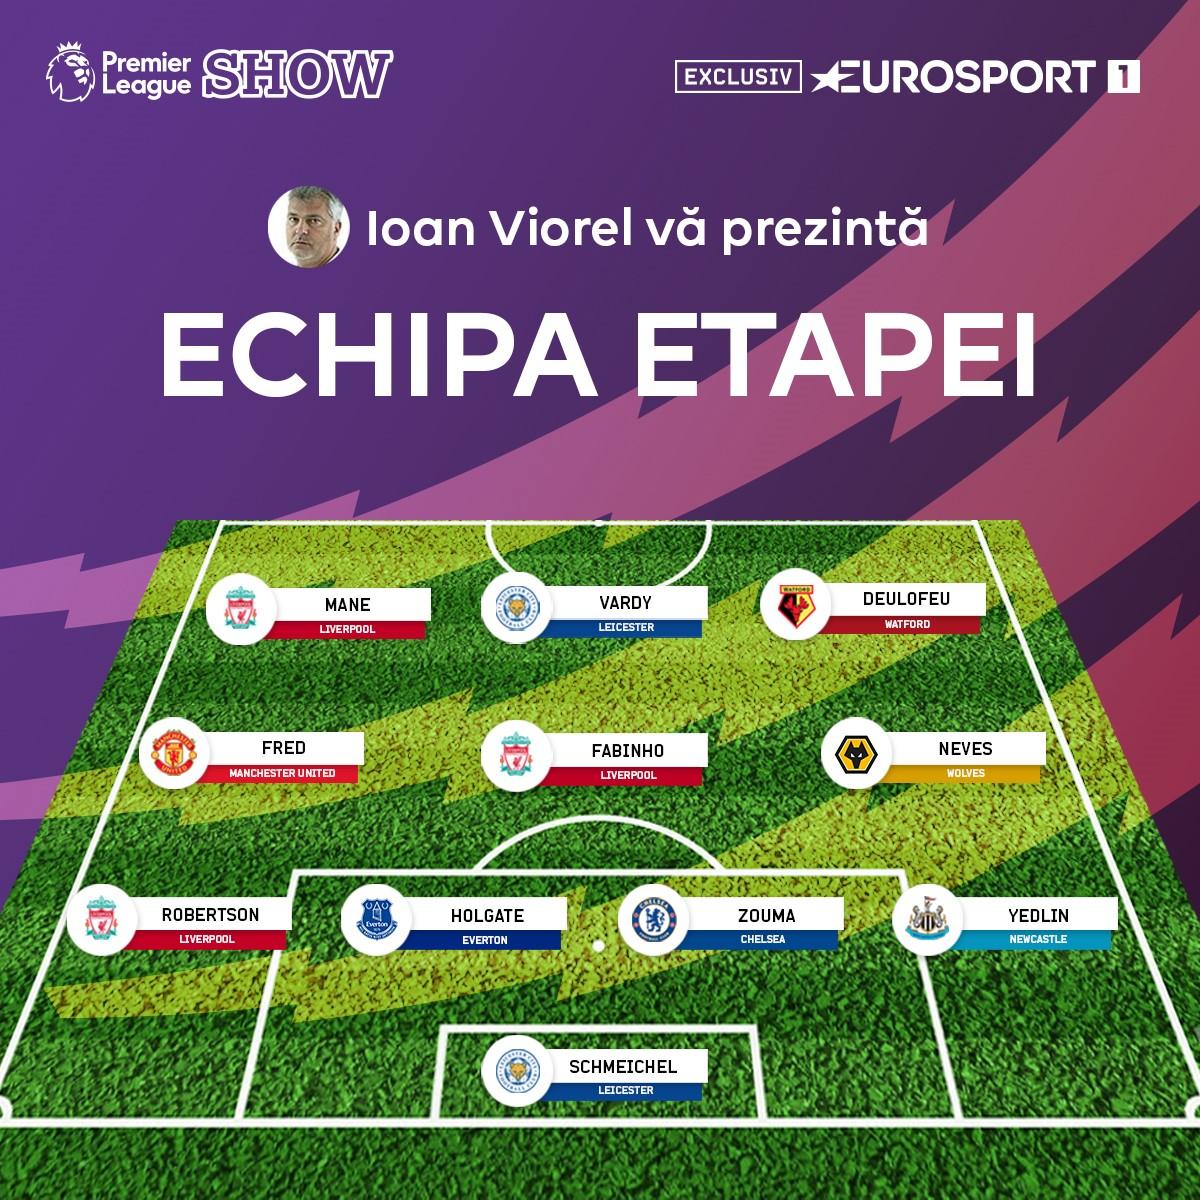 https://i.eurosport.com/2019/11/13/2716156.jpg